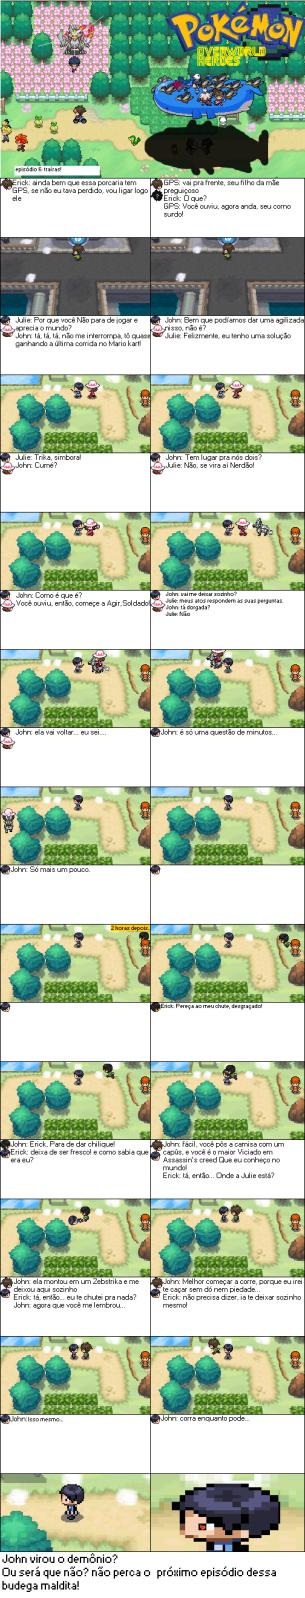 Pokémon Overworld Heroes [+72] 2mzwmlg